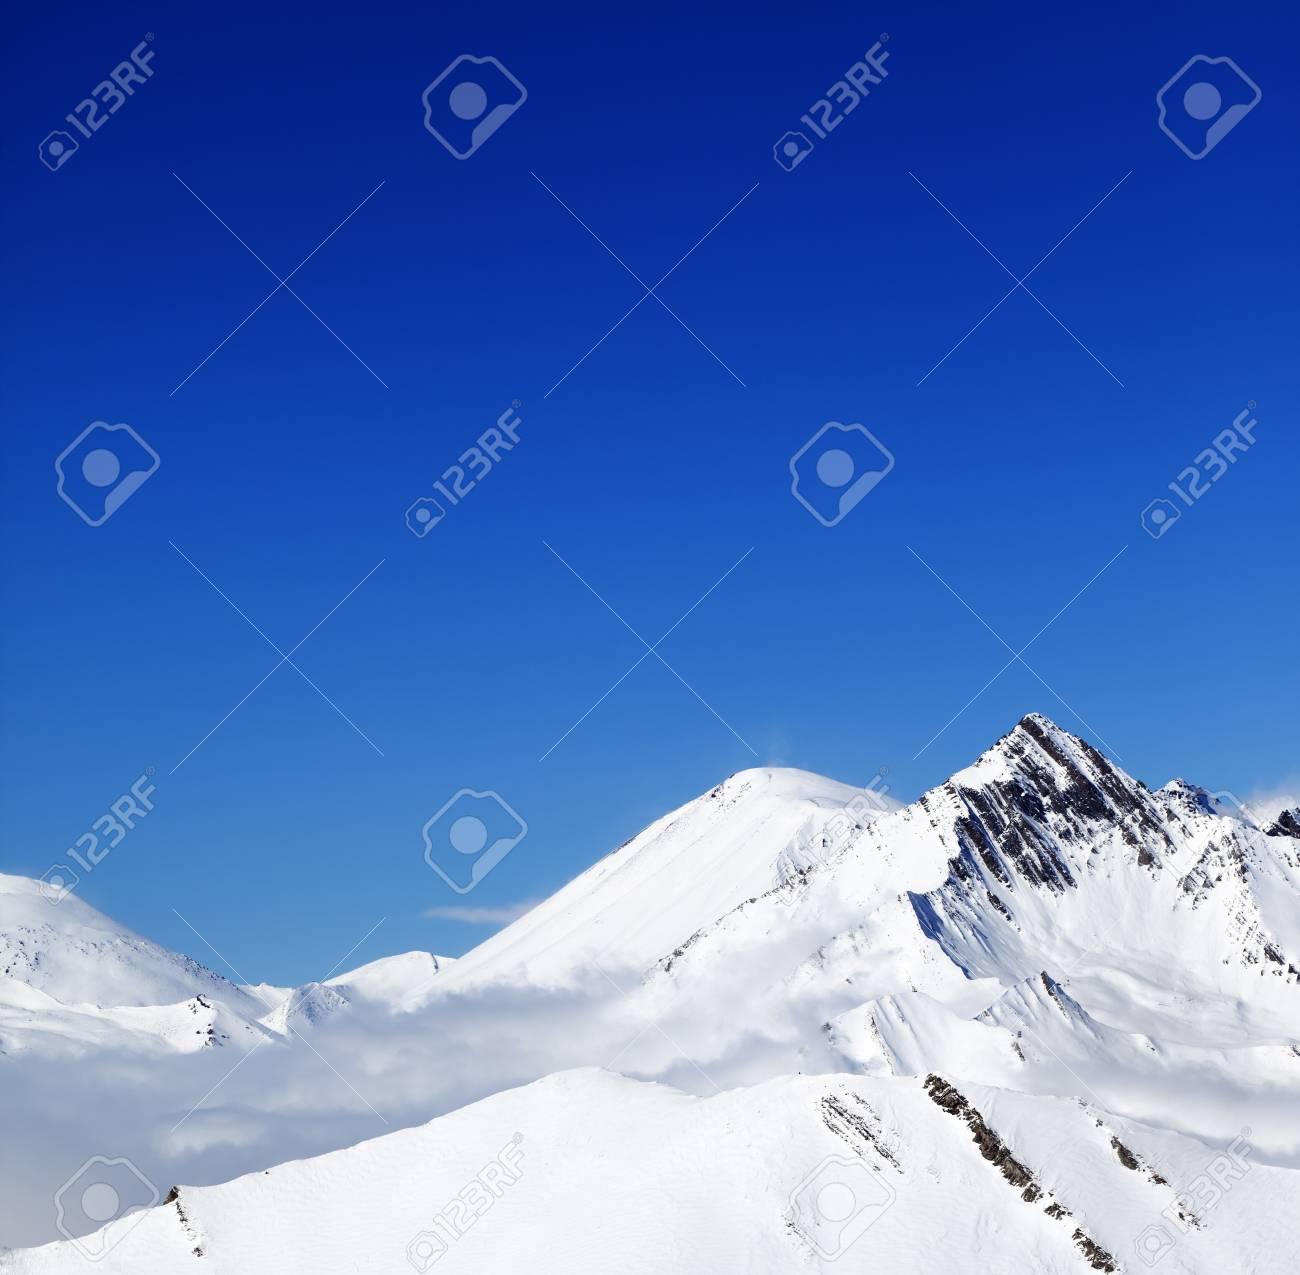 Winter Snowy Mountains At Nice Day Caucasus Mountains Georgia